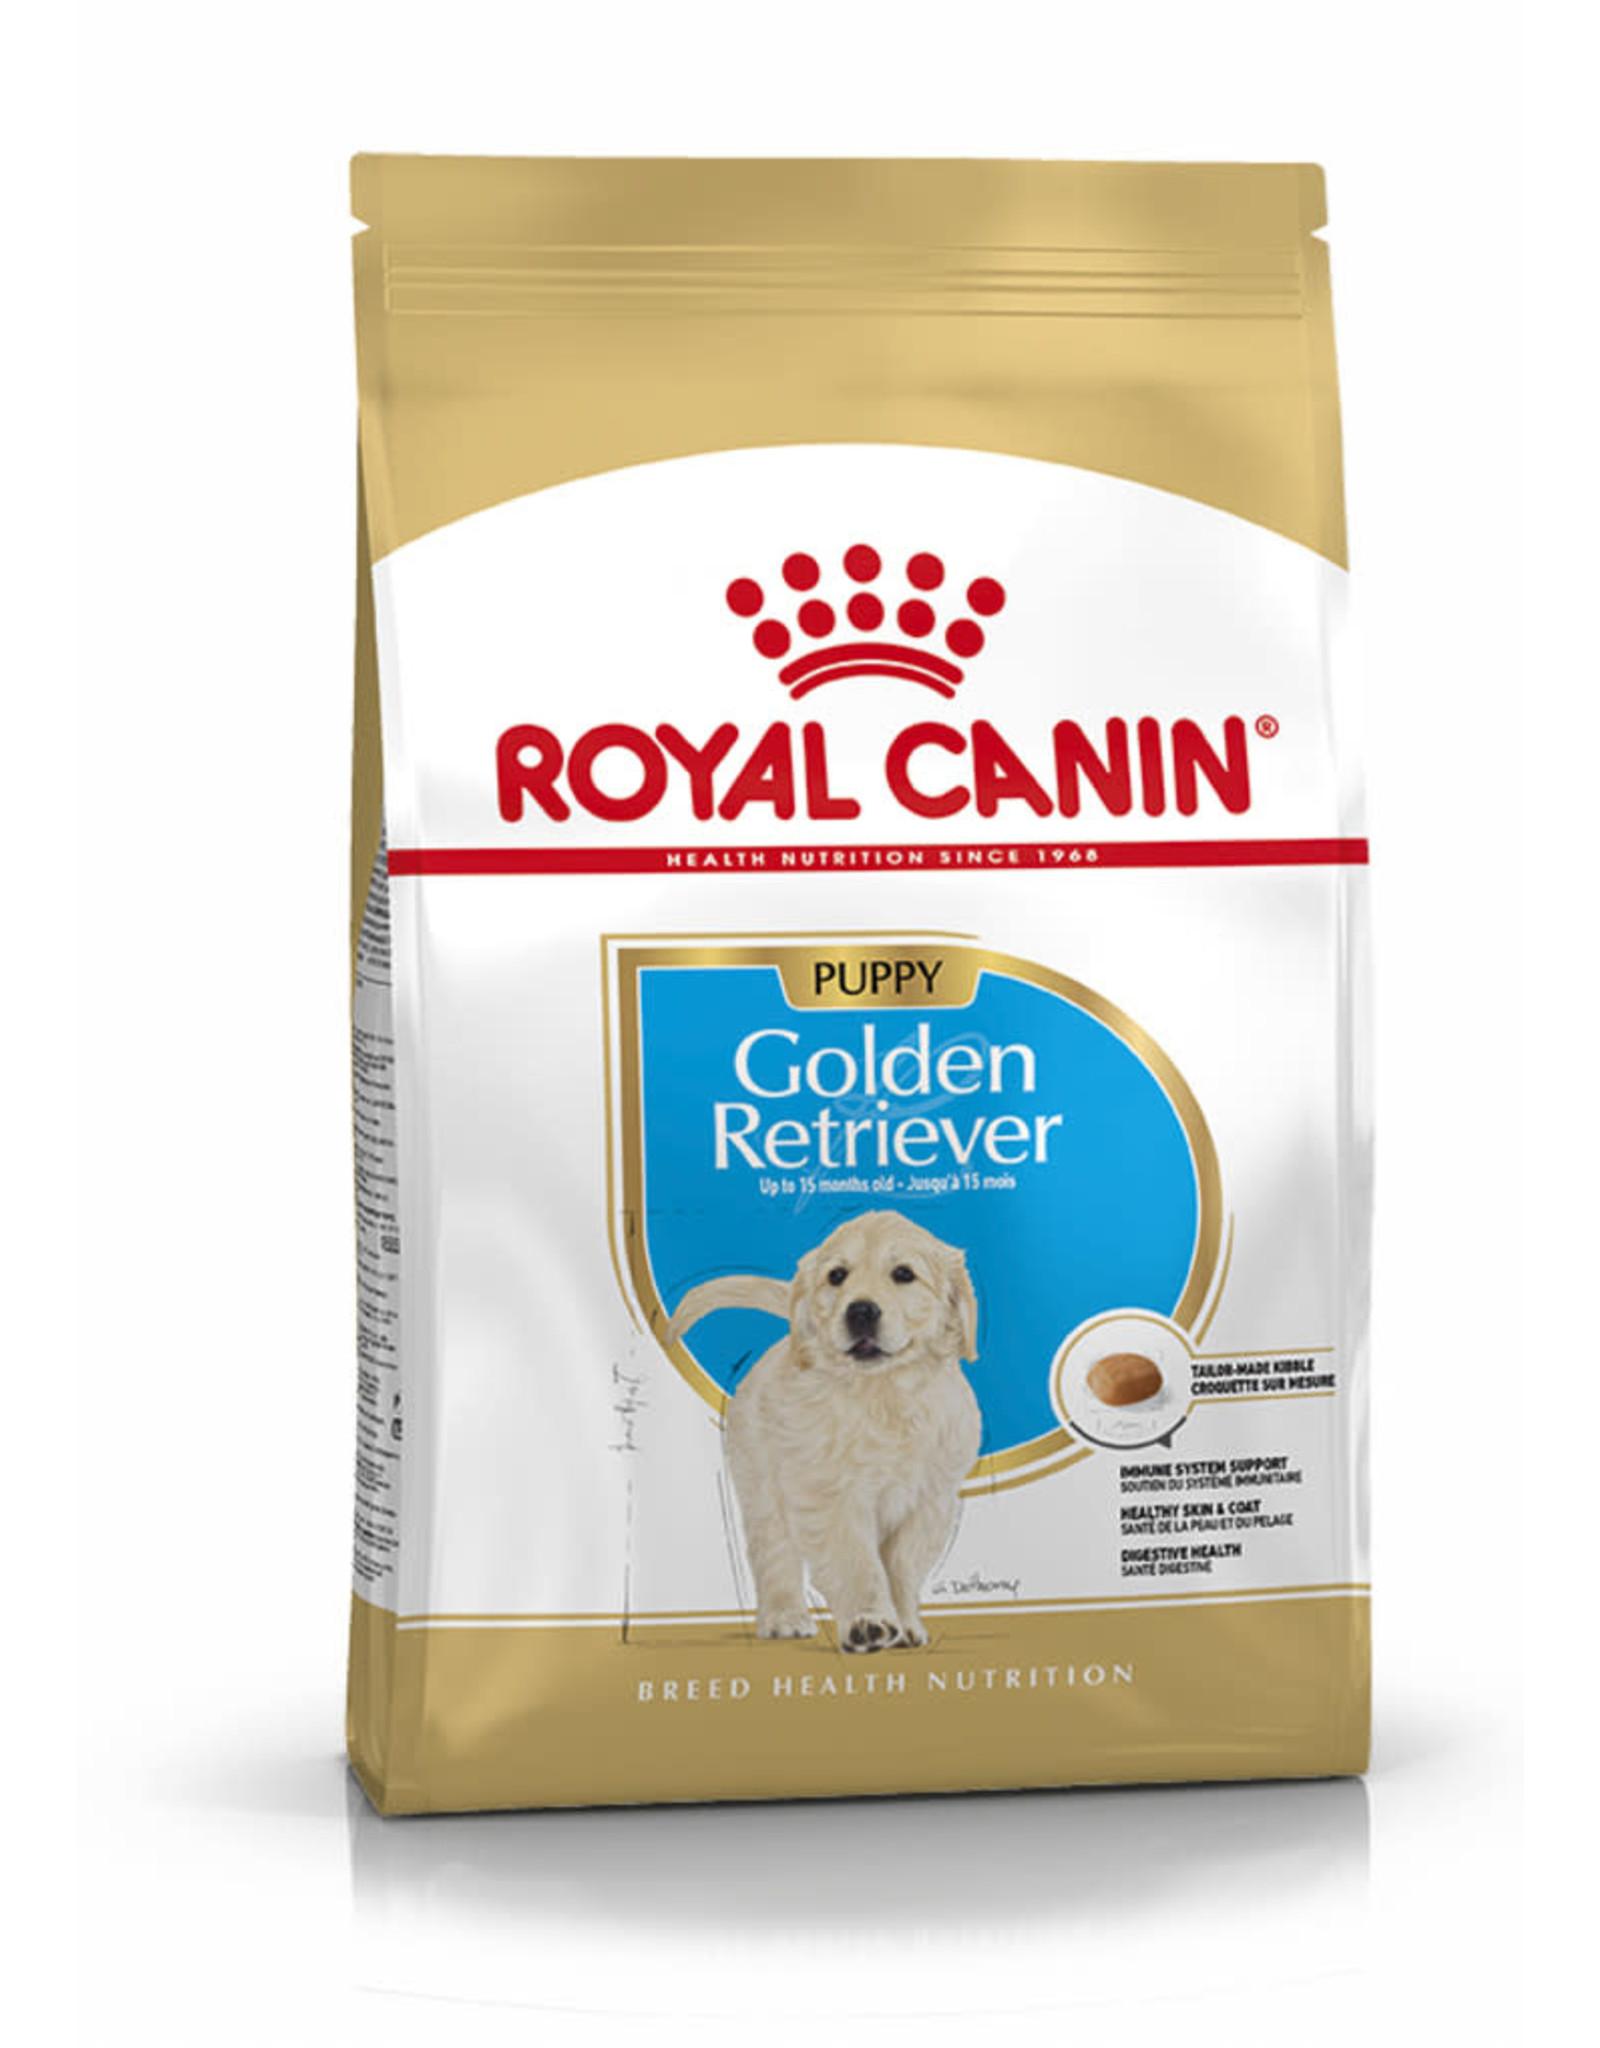 Royal Canin Golden Retriever Puppy Dry Food